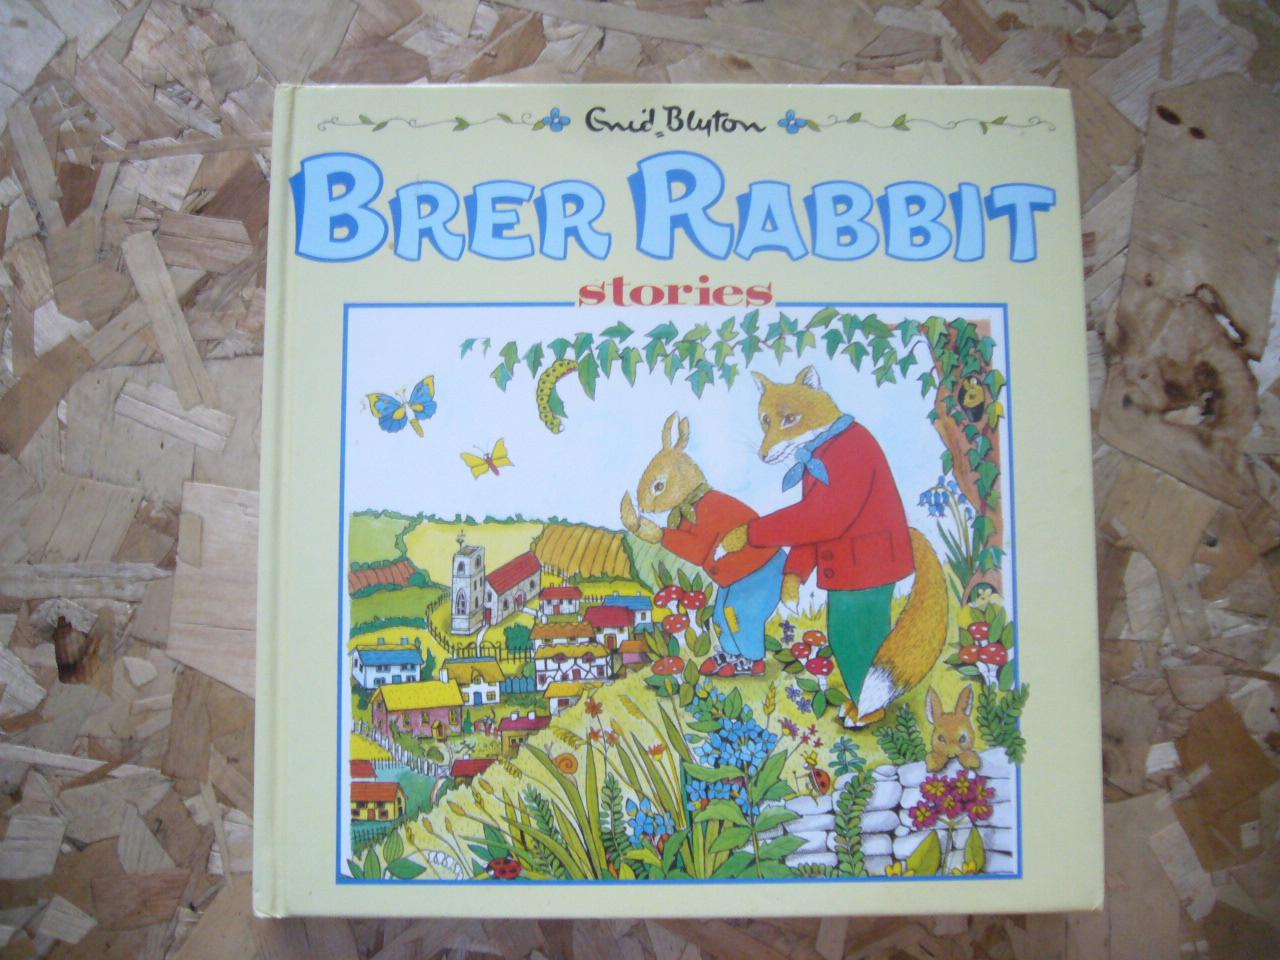 Brer Rabbit Stories (By Enid Blyton)